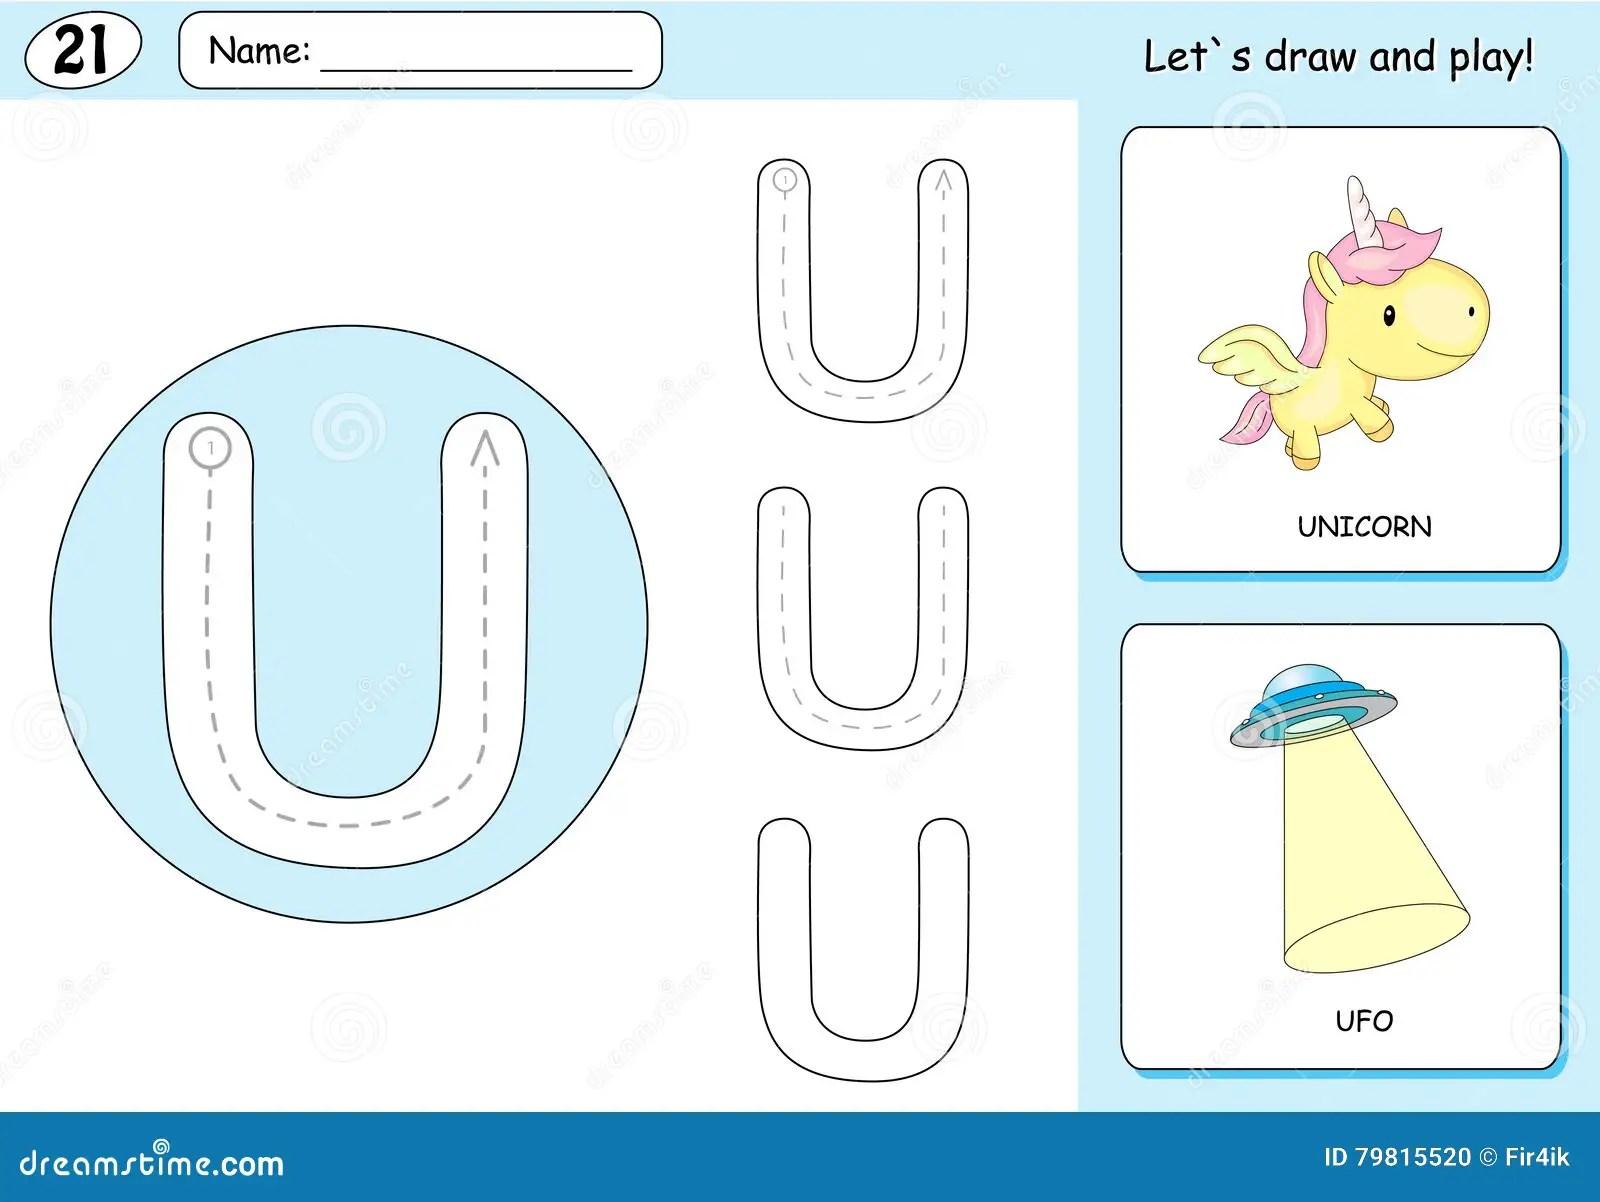 Cartoon Unicorn And Ufo Alphabet Tracing Worksheet